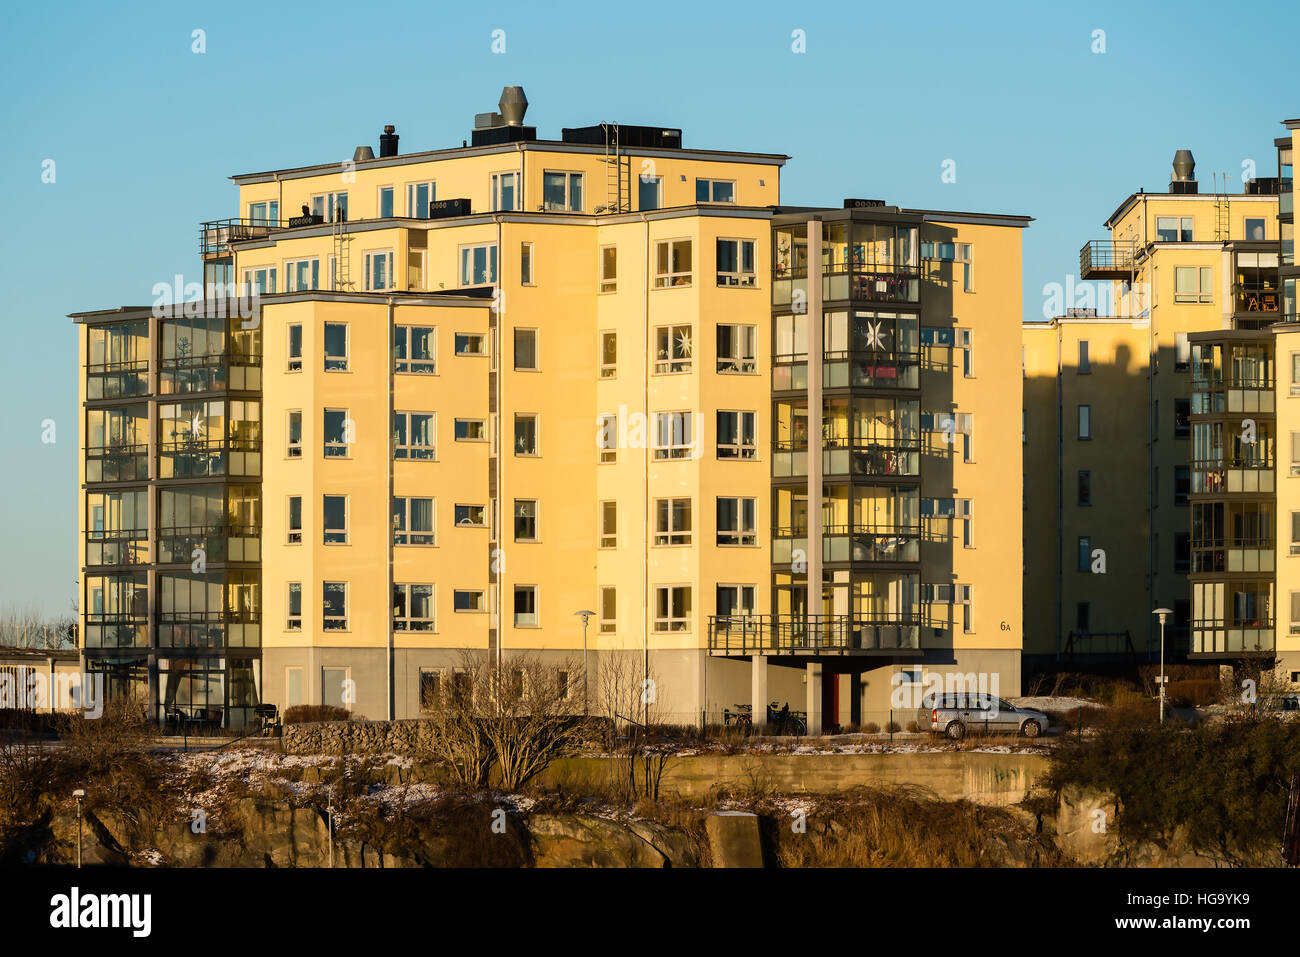 karlskrona, sweden - january 5, 2017: documentary of urban